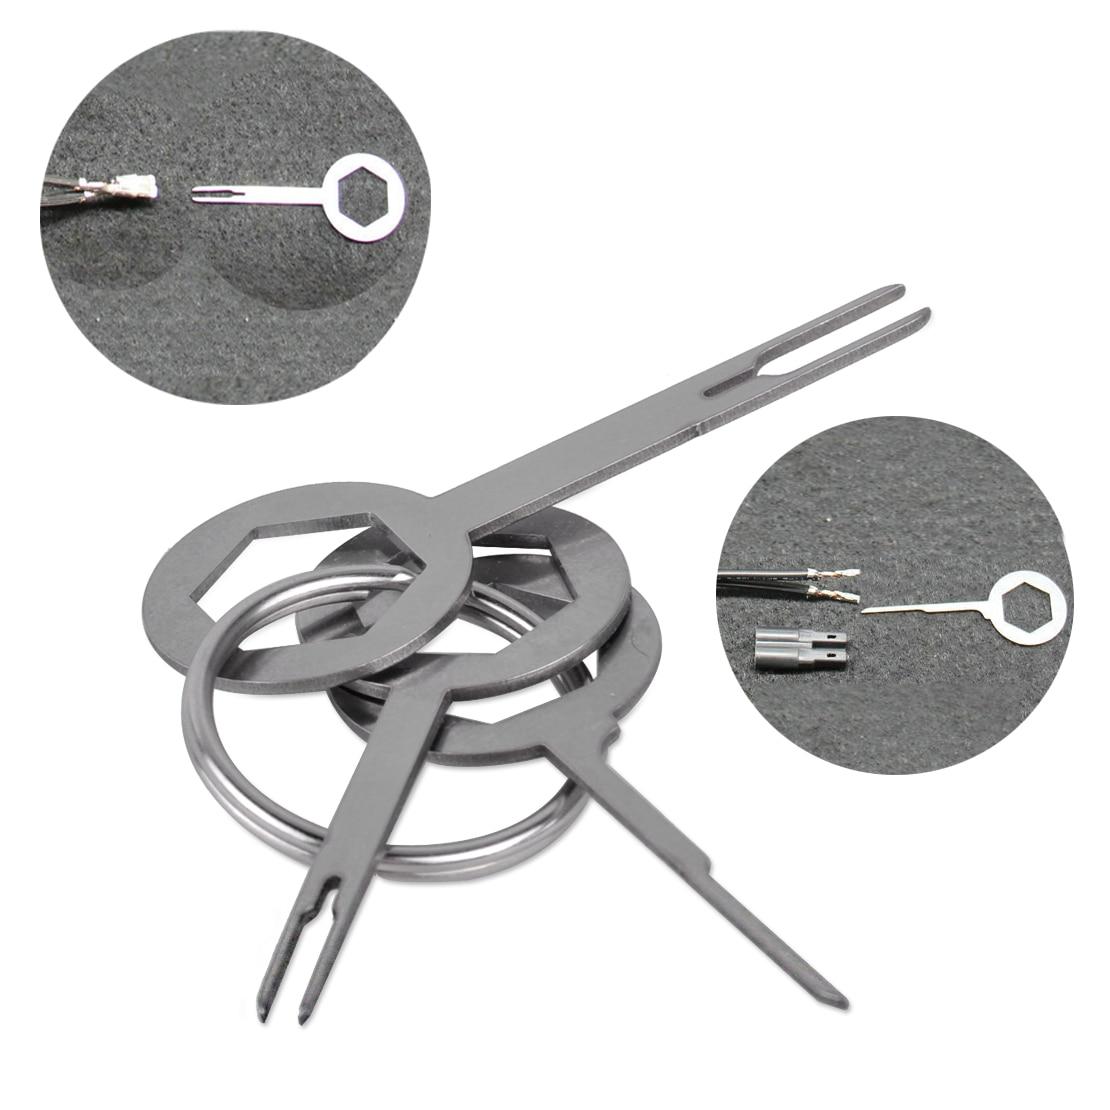 Aliexpress.com : Buy CITALL 3pcs Car Wire Terminal Removal